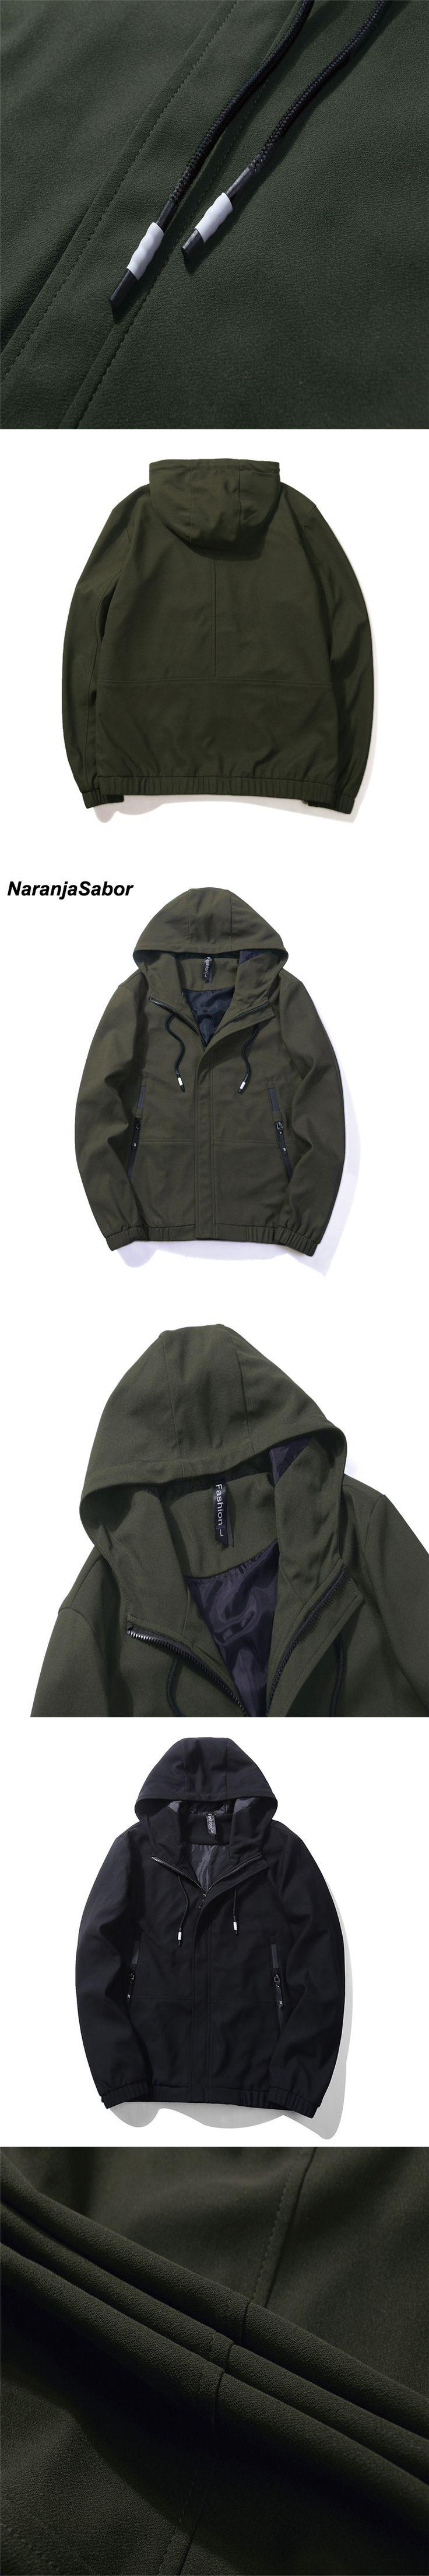 NaranjaSabor 2017 Autumn Men's Jacket Army Bomber Jackets Mens Clothing Slim Pilot Flight Coat Baseball Male Mens Coats EU SIZE